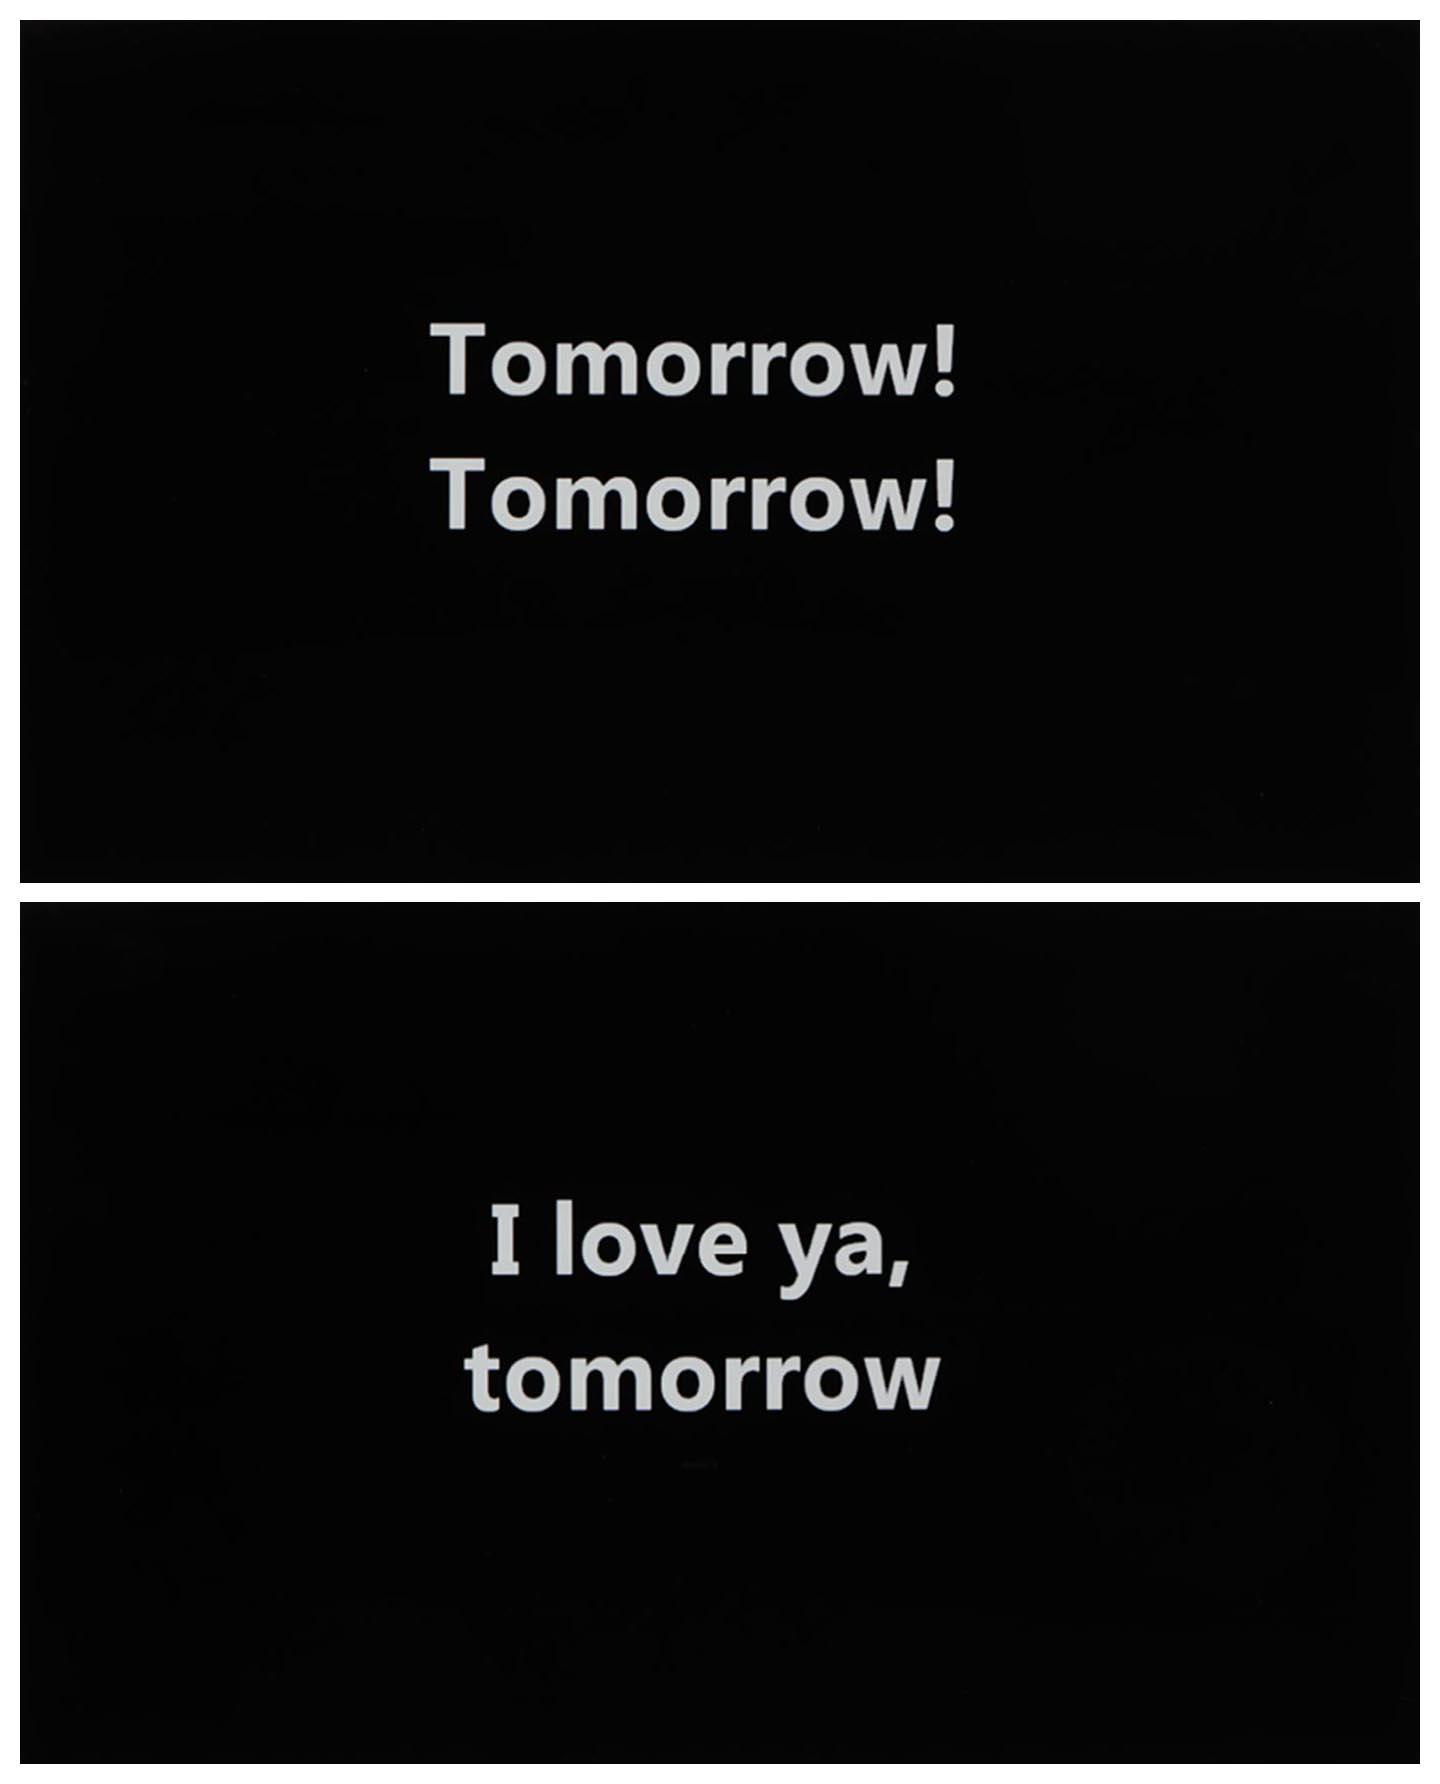 Kate Jarboe  - Tomorrow! Tomorrow! and I Love Ya, Tomorrow!